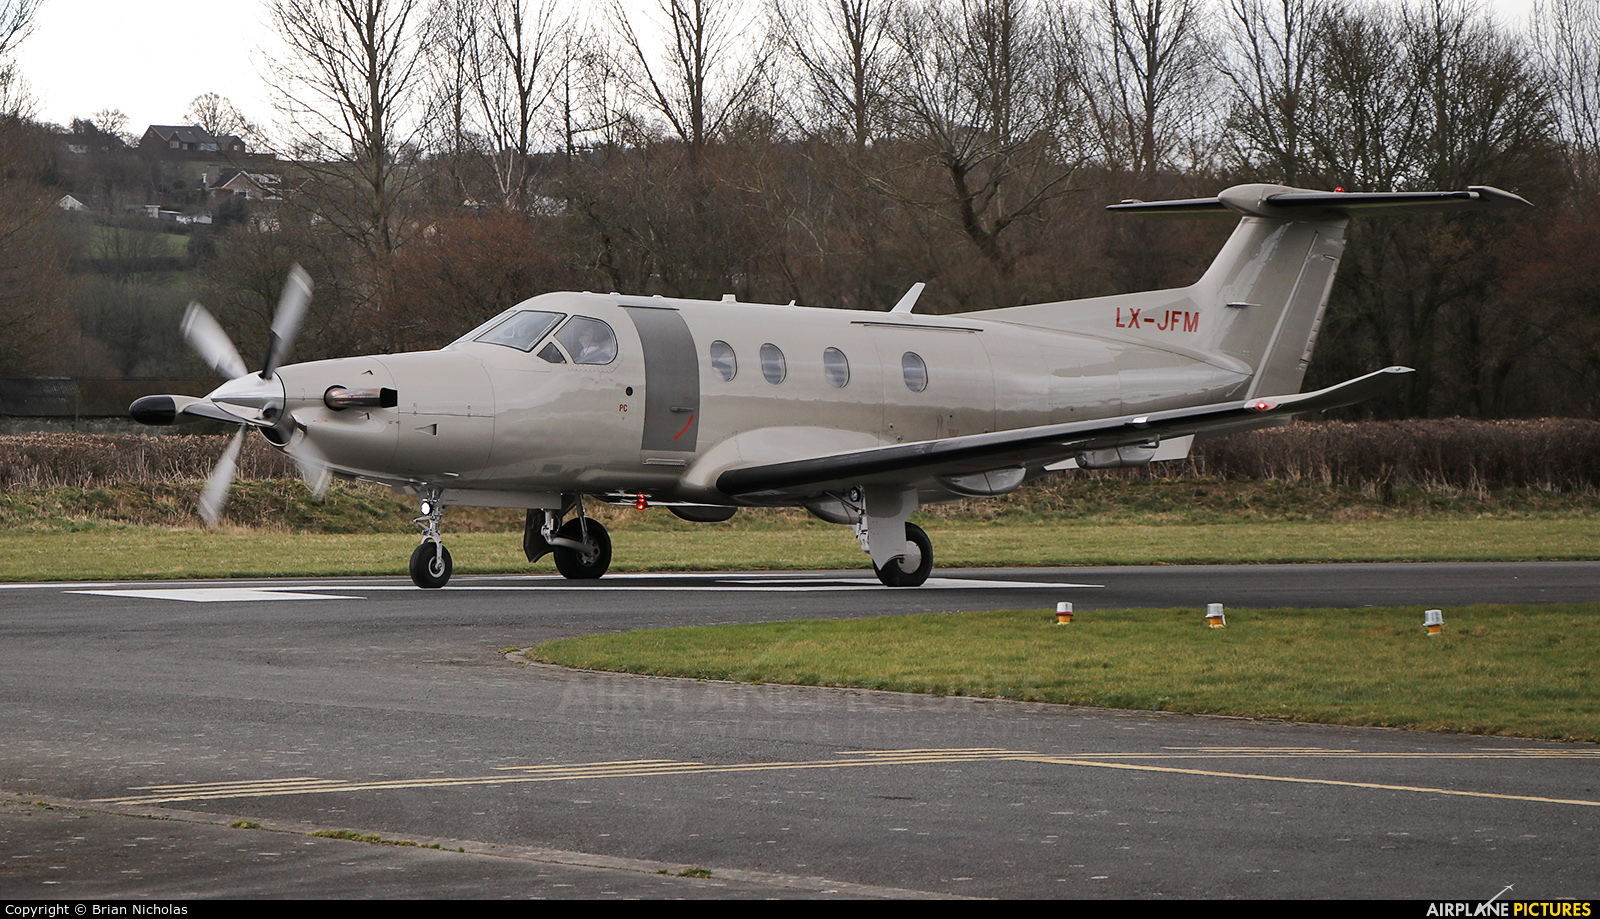 Jetfly Aviation LX-JFM aircraft at Welshpool